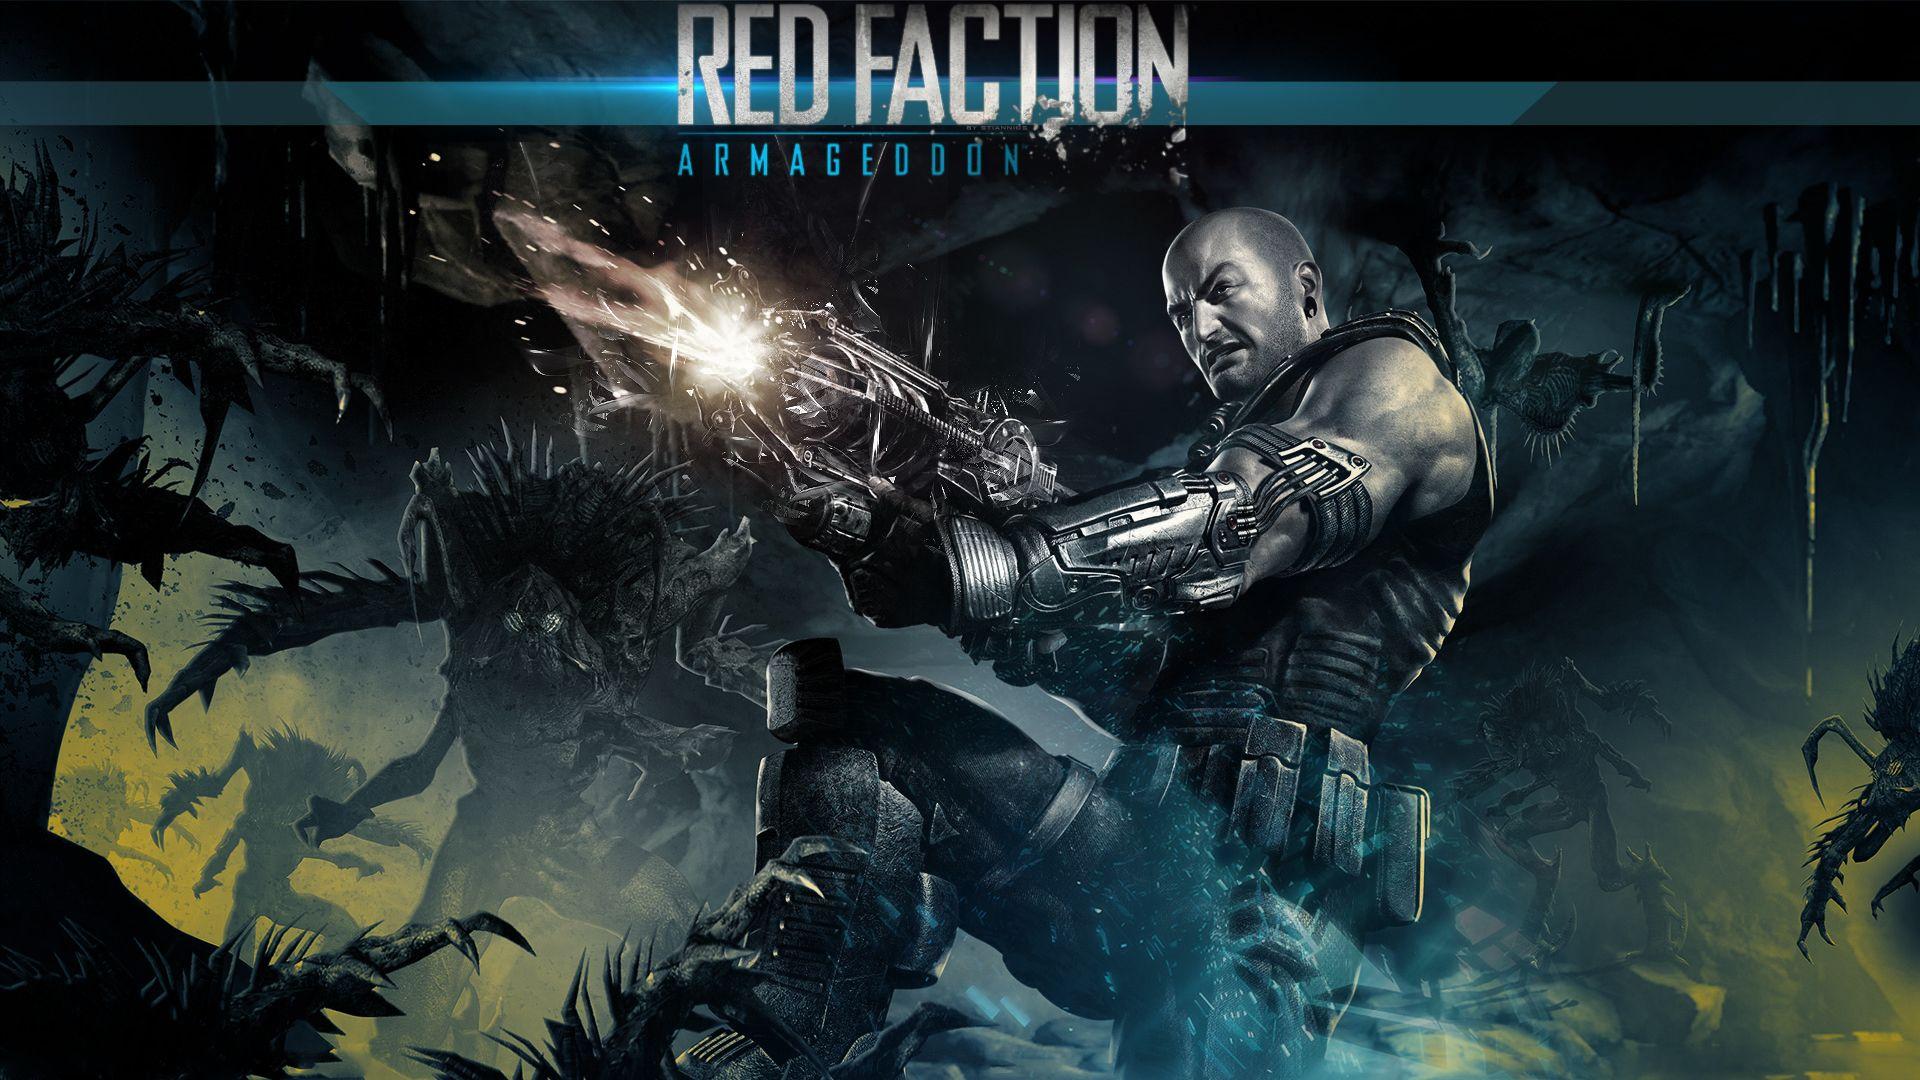 Pin Red Faction Armageddon Desktop Wallpaper Nr 59846 By Stiannius on ...